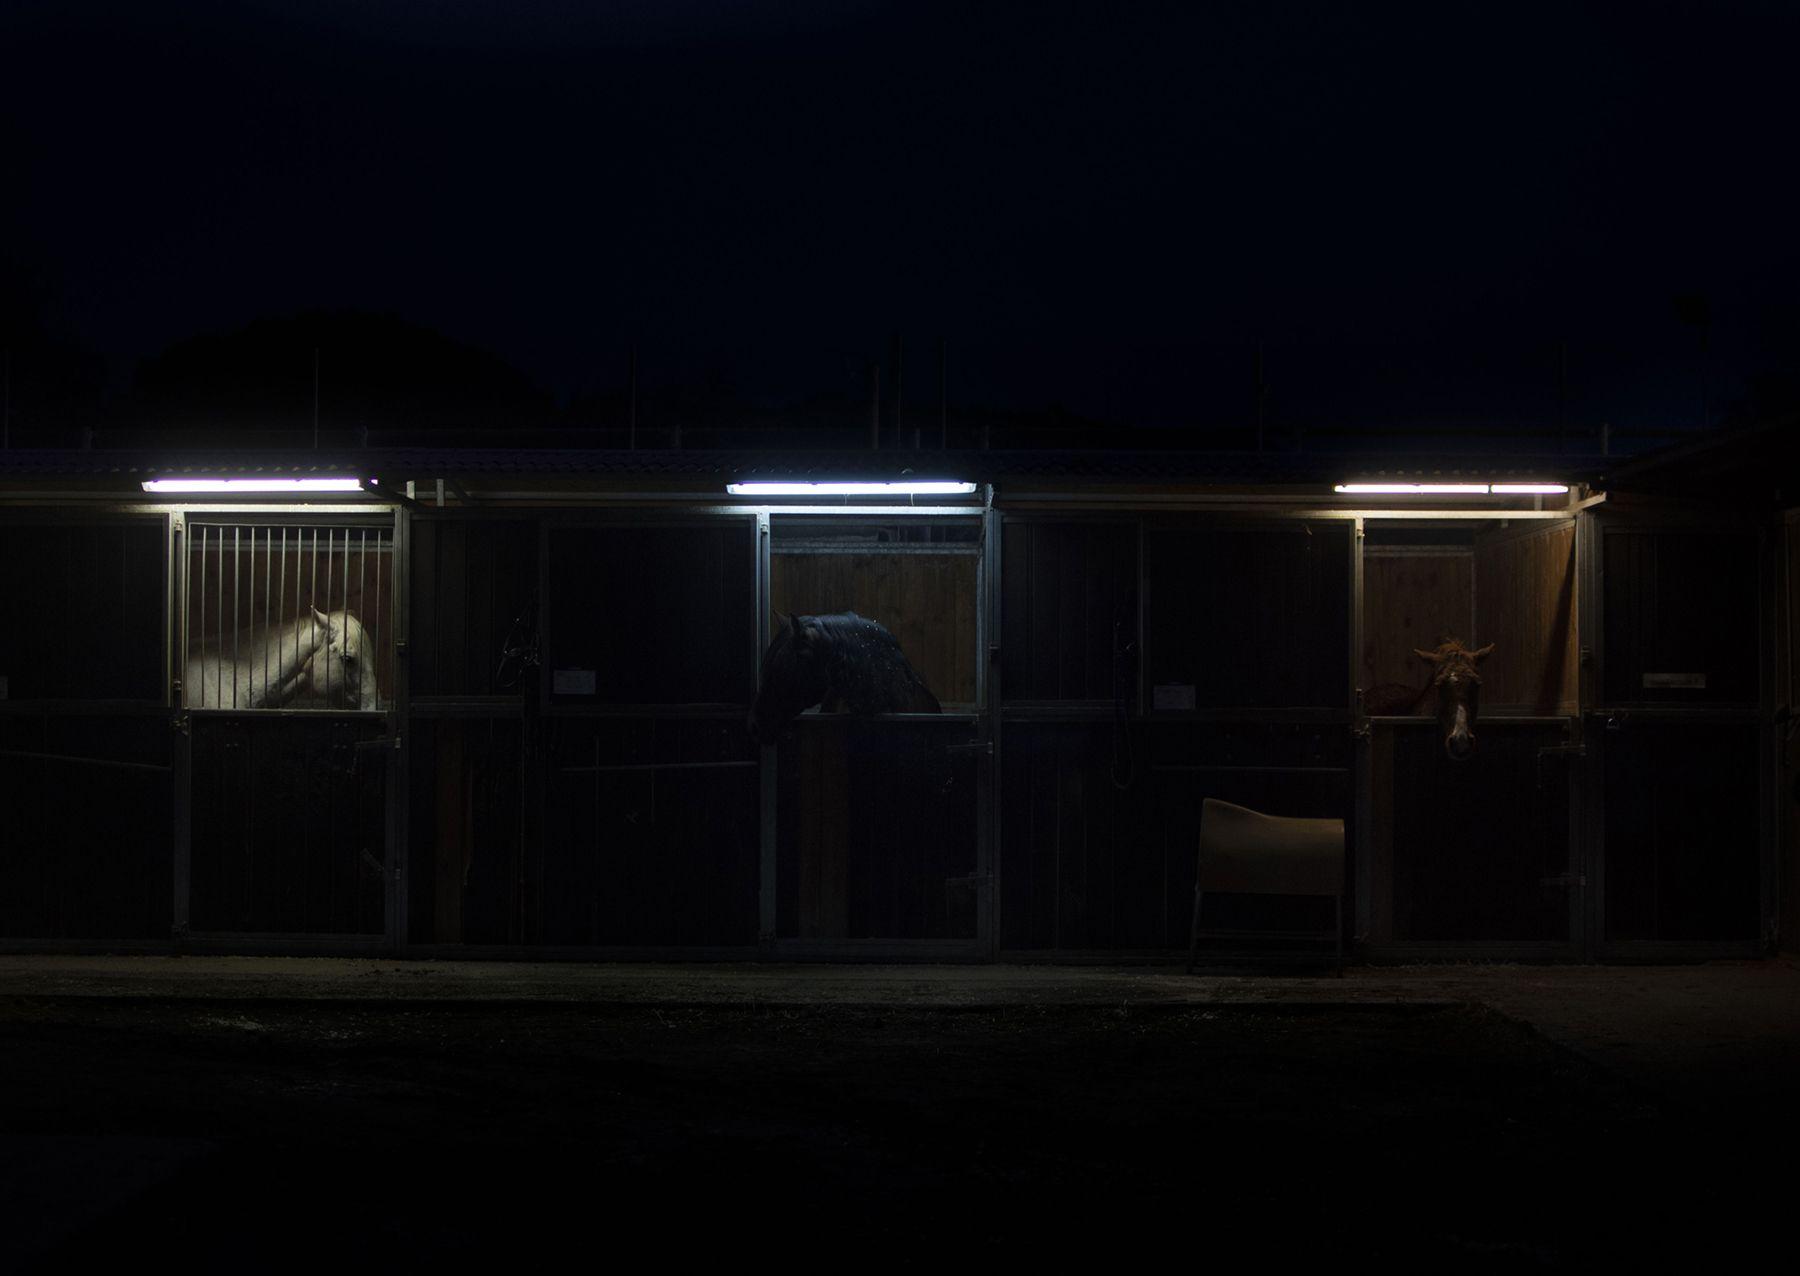 'Sigilo nocturno' feta a Sant Cugat. FOTO: Raquel Maes